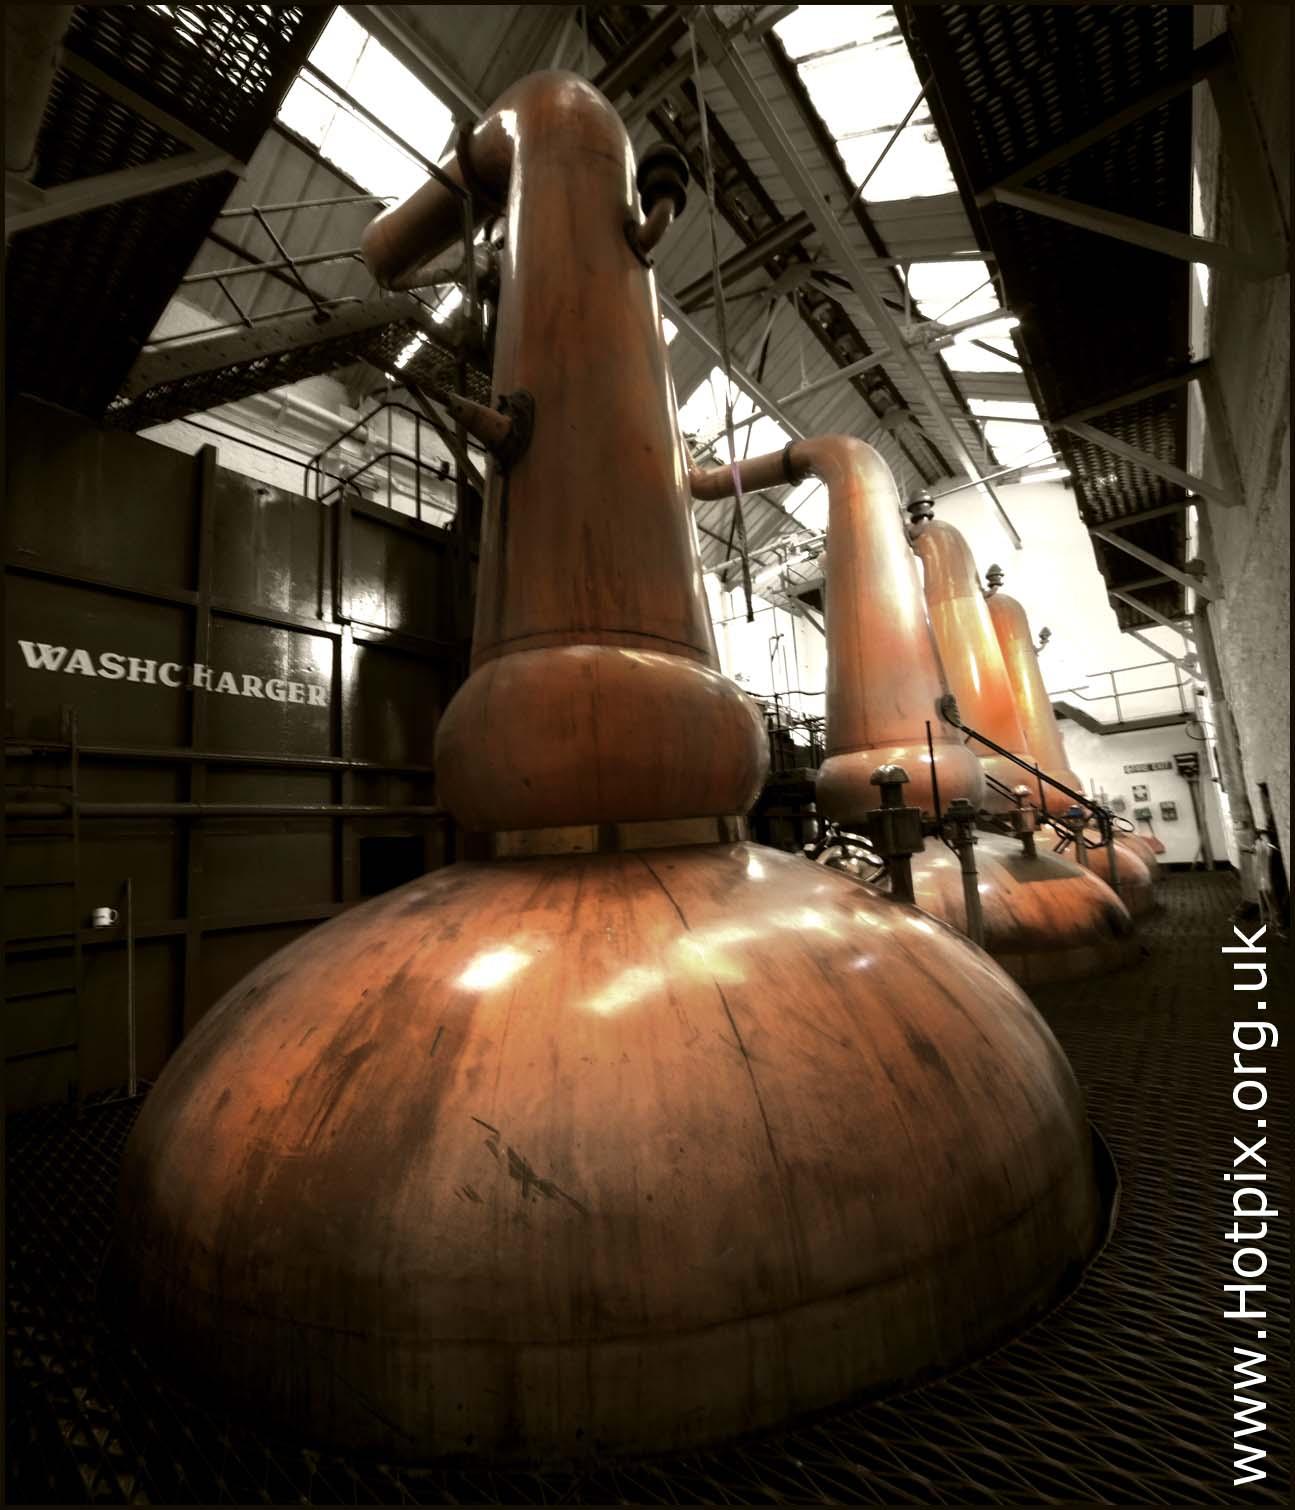 Scotland,distilliary,copper,pot,stills,Tobermory,Scotch,whisky,d scotland,distillery,isle,Mull,hebrides,UK,britain,islands,spirit,drinks,wee,dram,peat,malted,barley,grain,glass,drink,drinking,scots,scottish,heritage,balamory,selective,colour,color,black,white,b/w,mono,This,Photo,Rocks,thisphotorocks,old,stuff,selectivo,couleur,s\u00e9lective,vorgew\u00e4hlte,Farbe,sex,sexy,architecture,building,buildings,edinbrugh,hotpix!,#tonysmith,#tonysmithhotpix